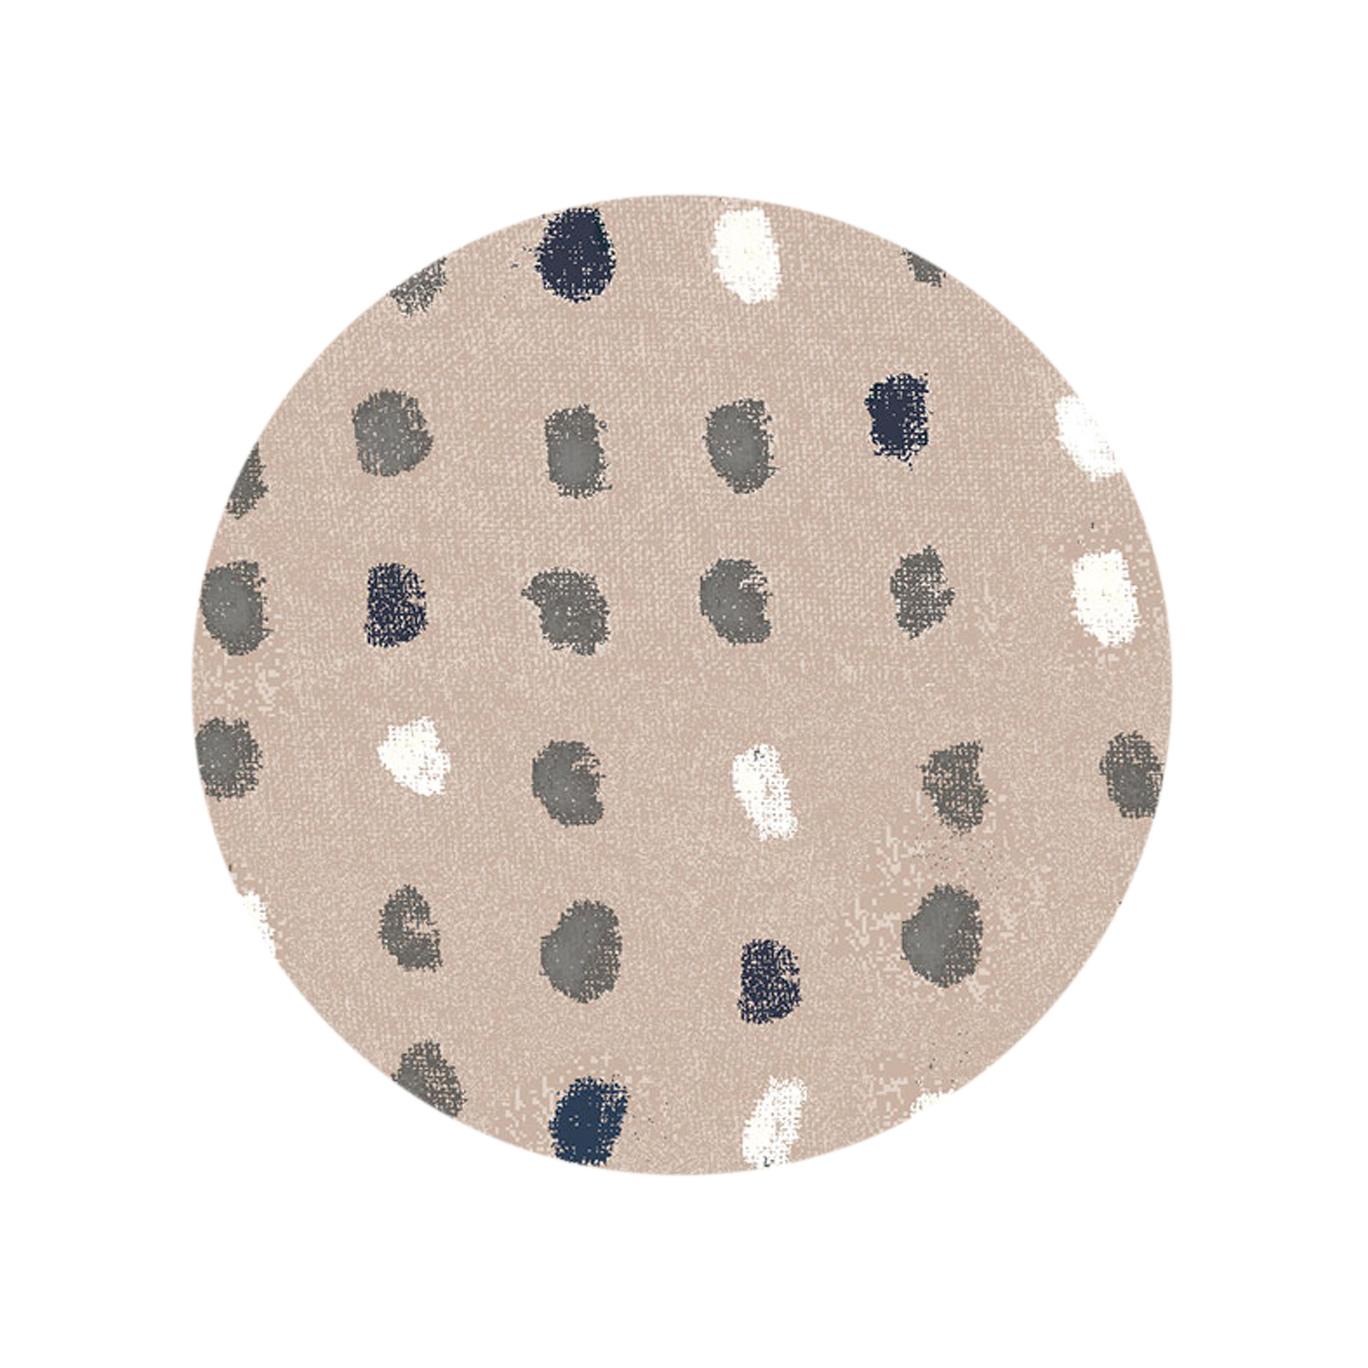 Drawn Dots - Dusty Blush